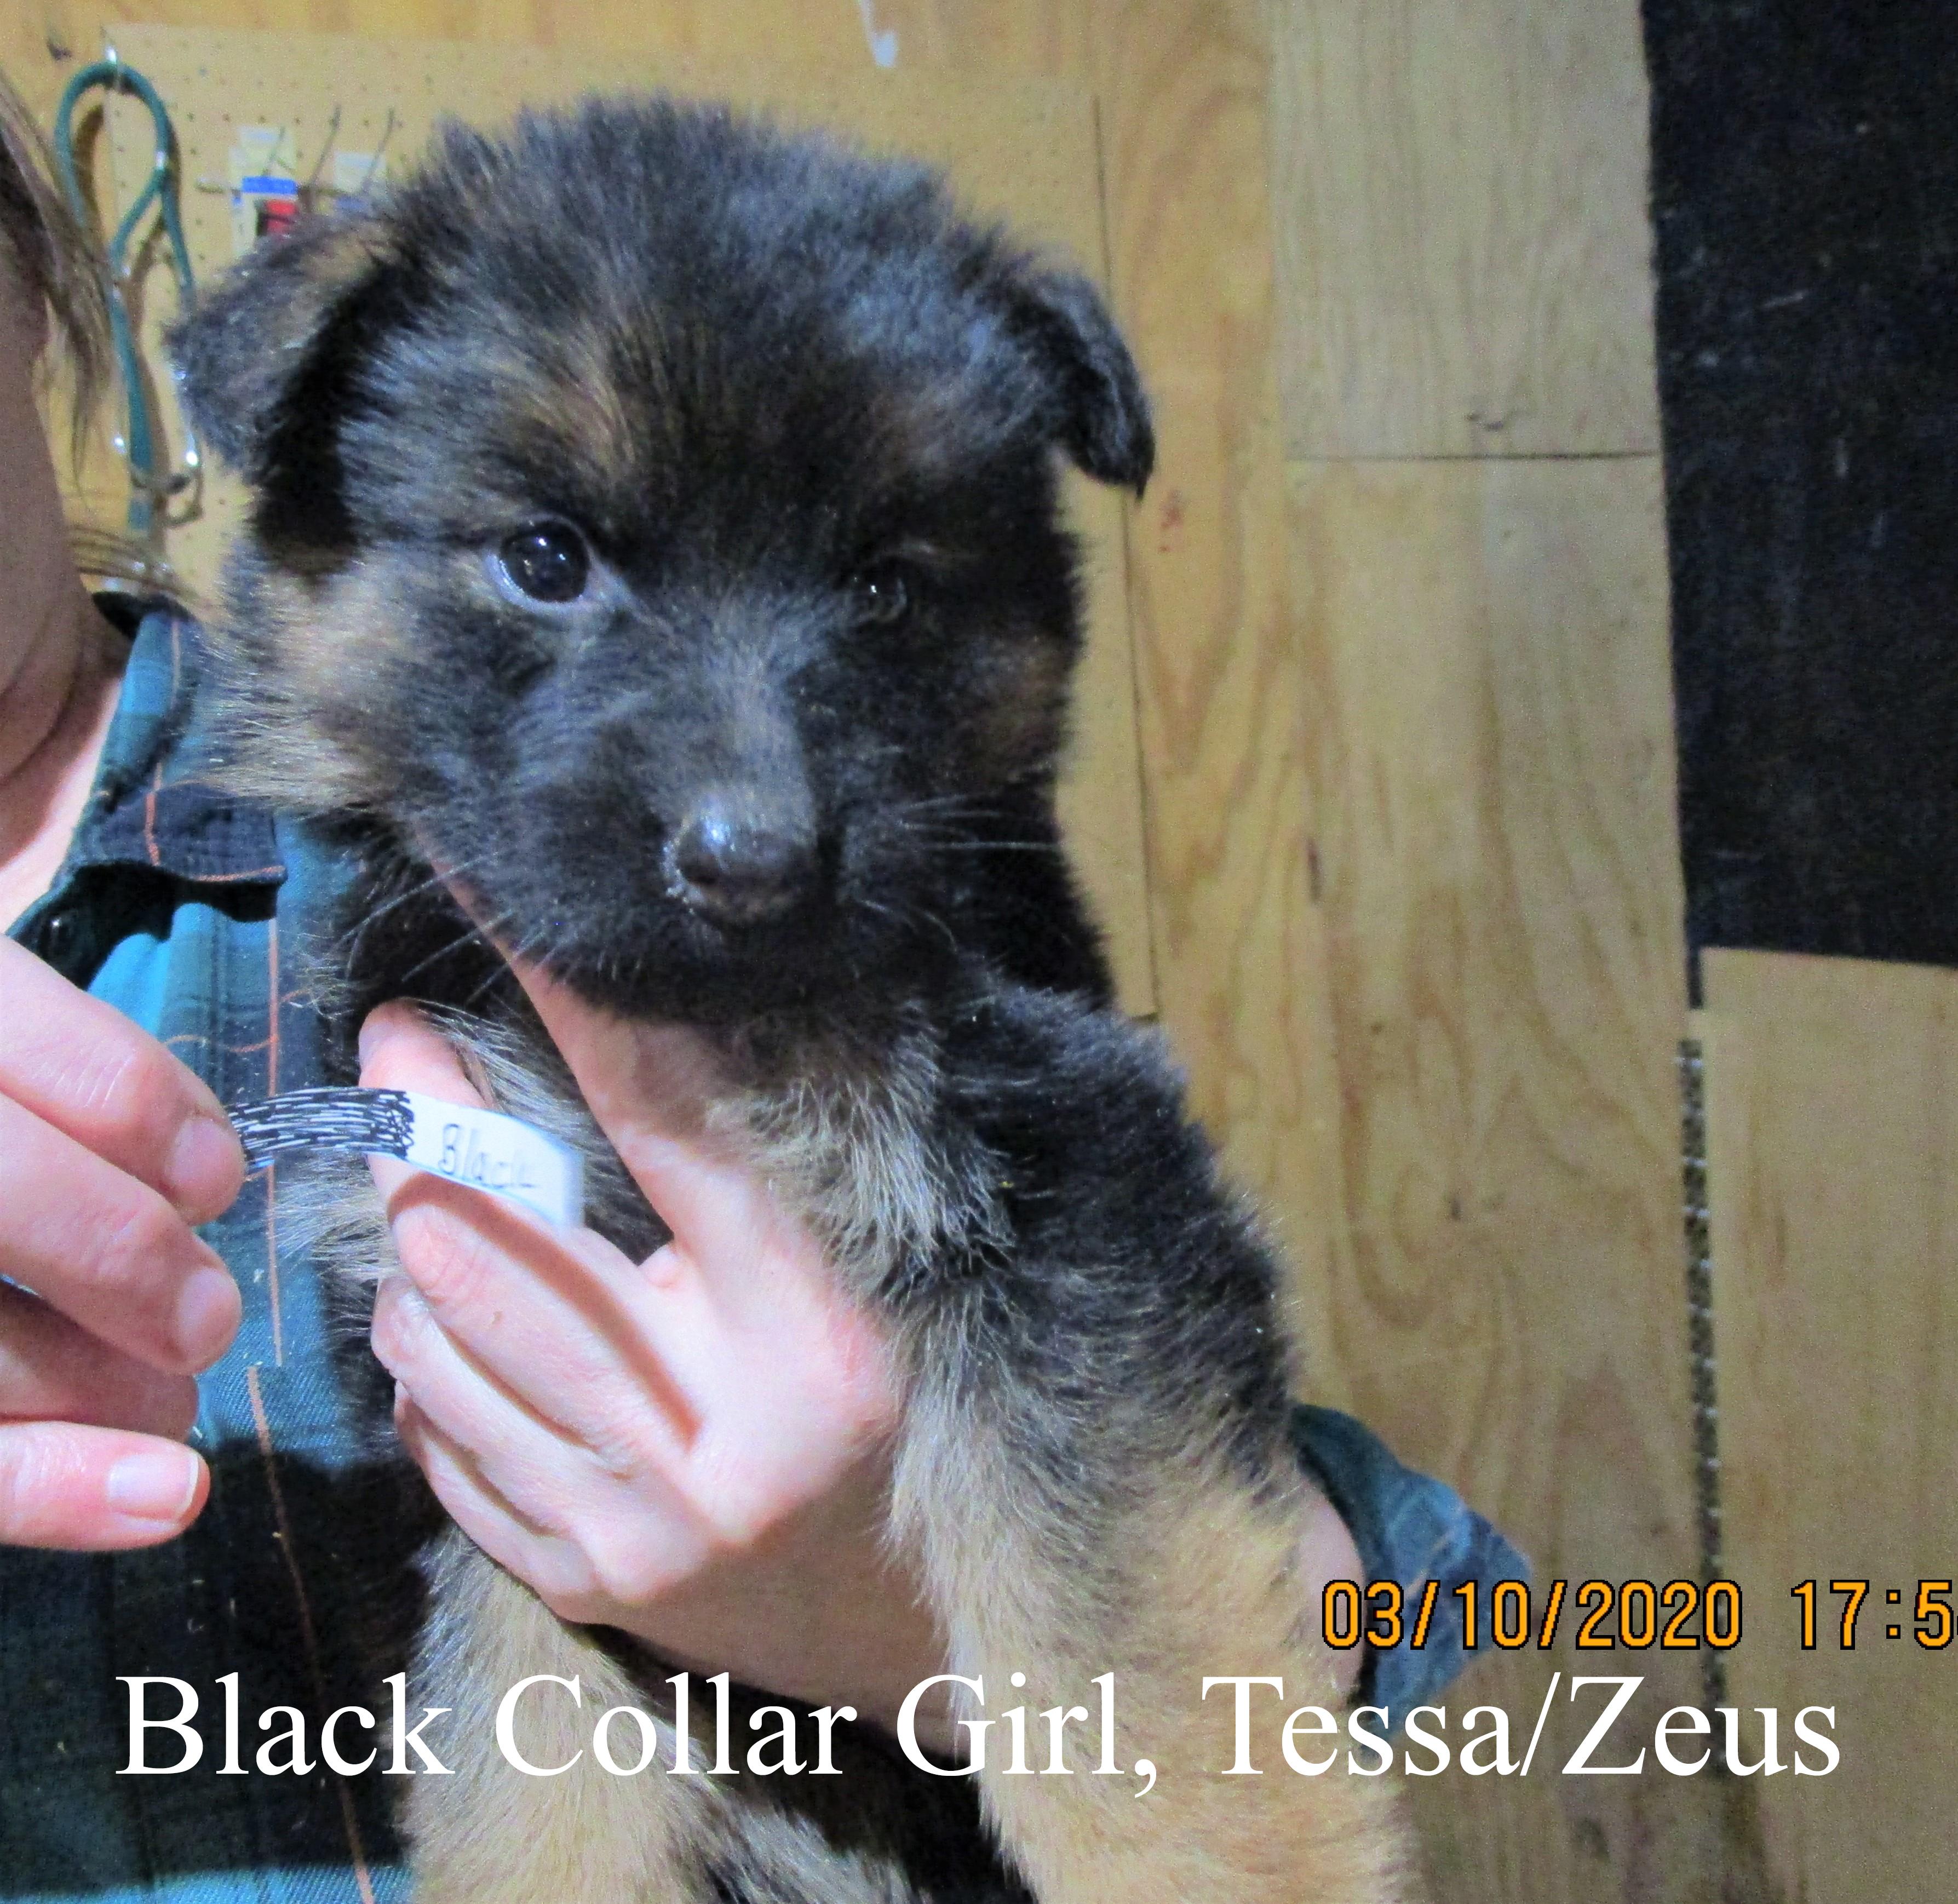 Black Collar Girl, typed